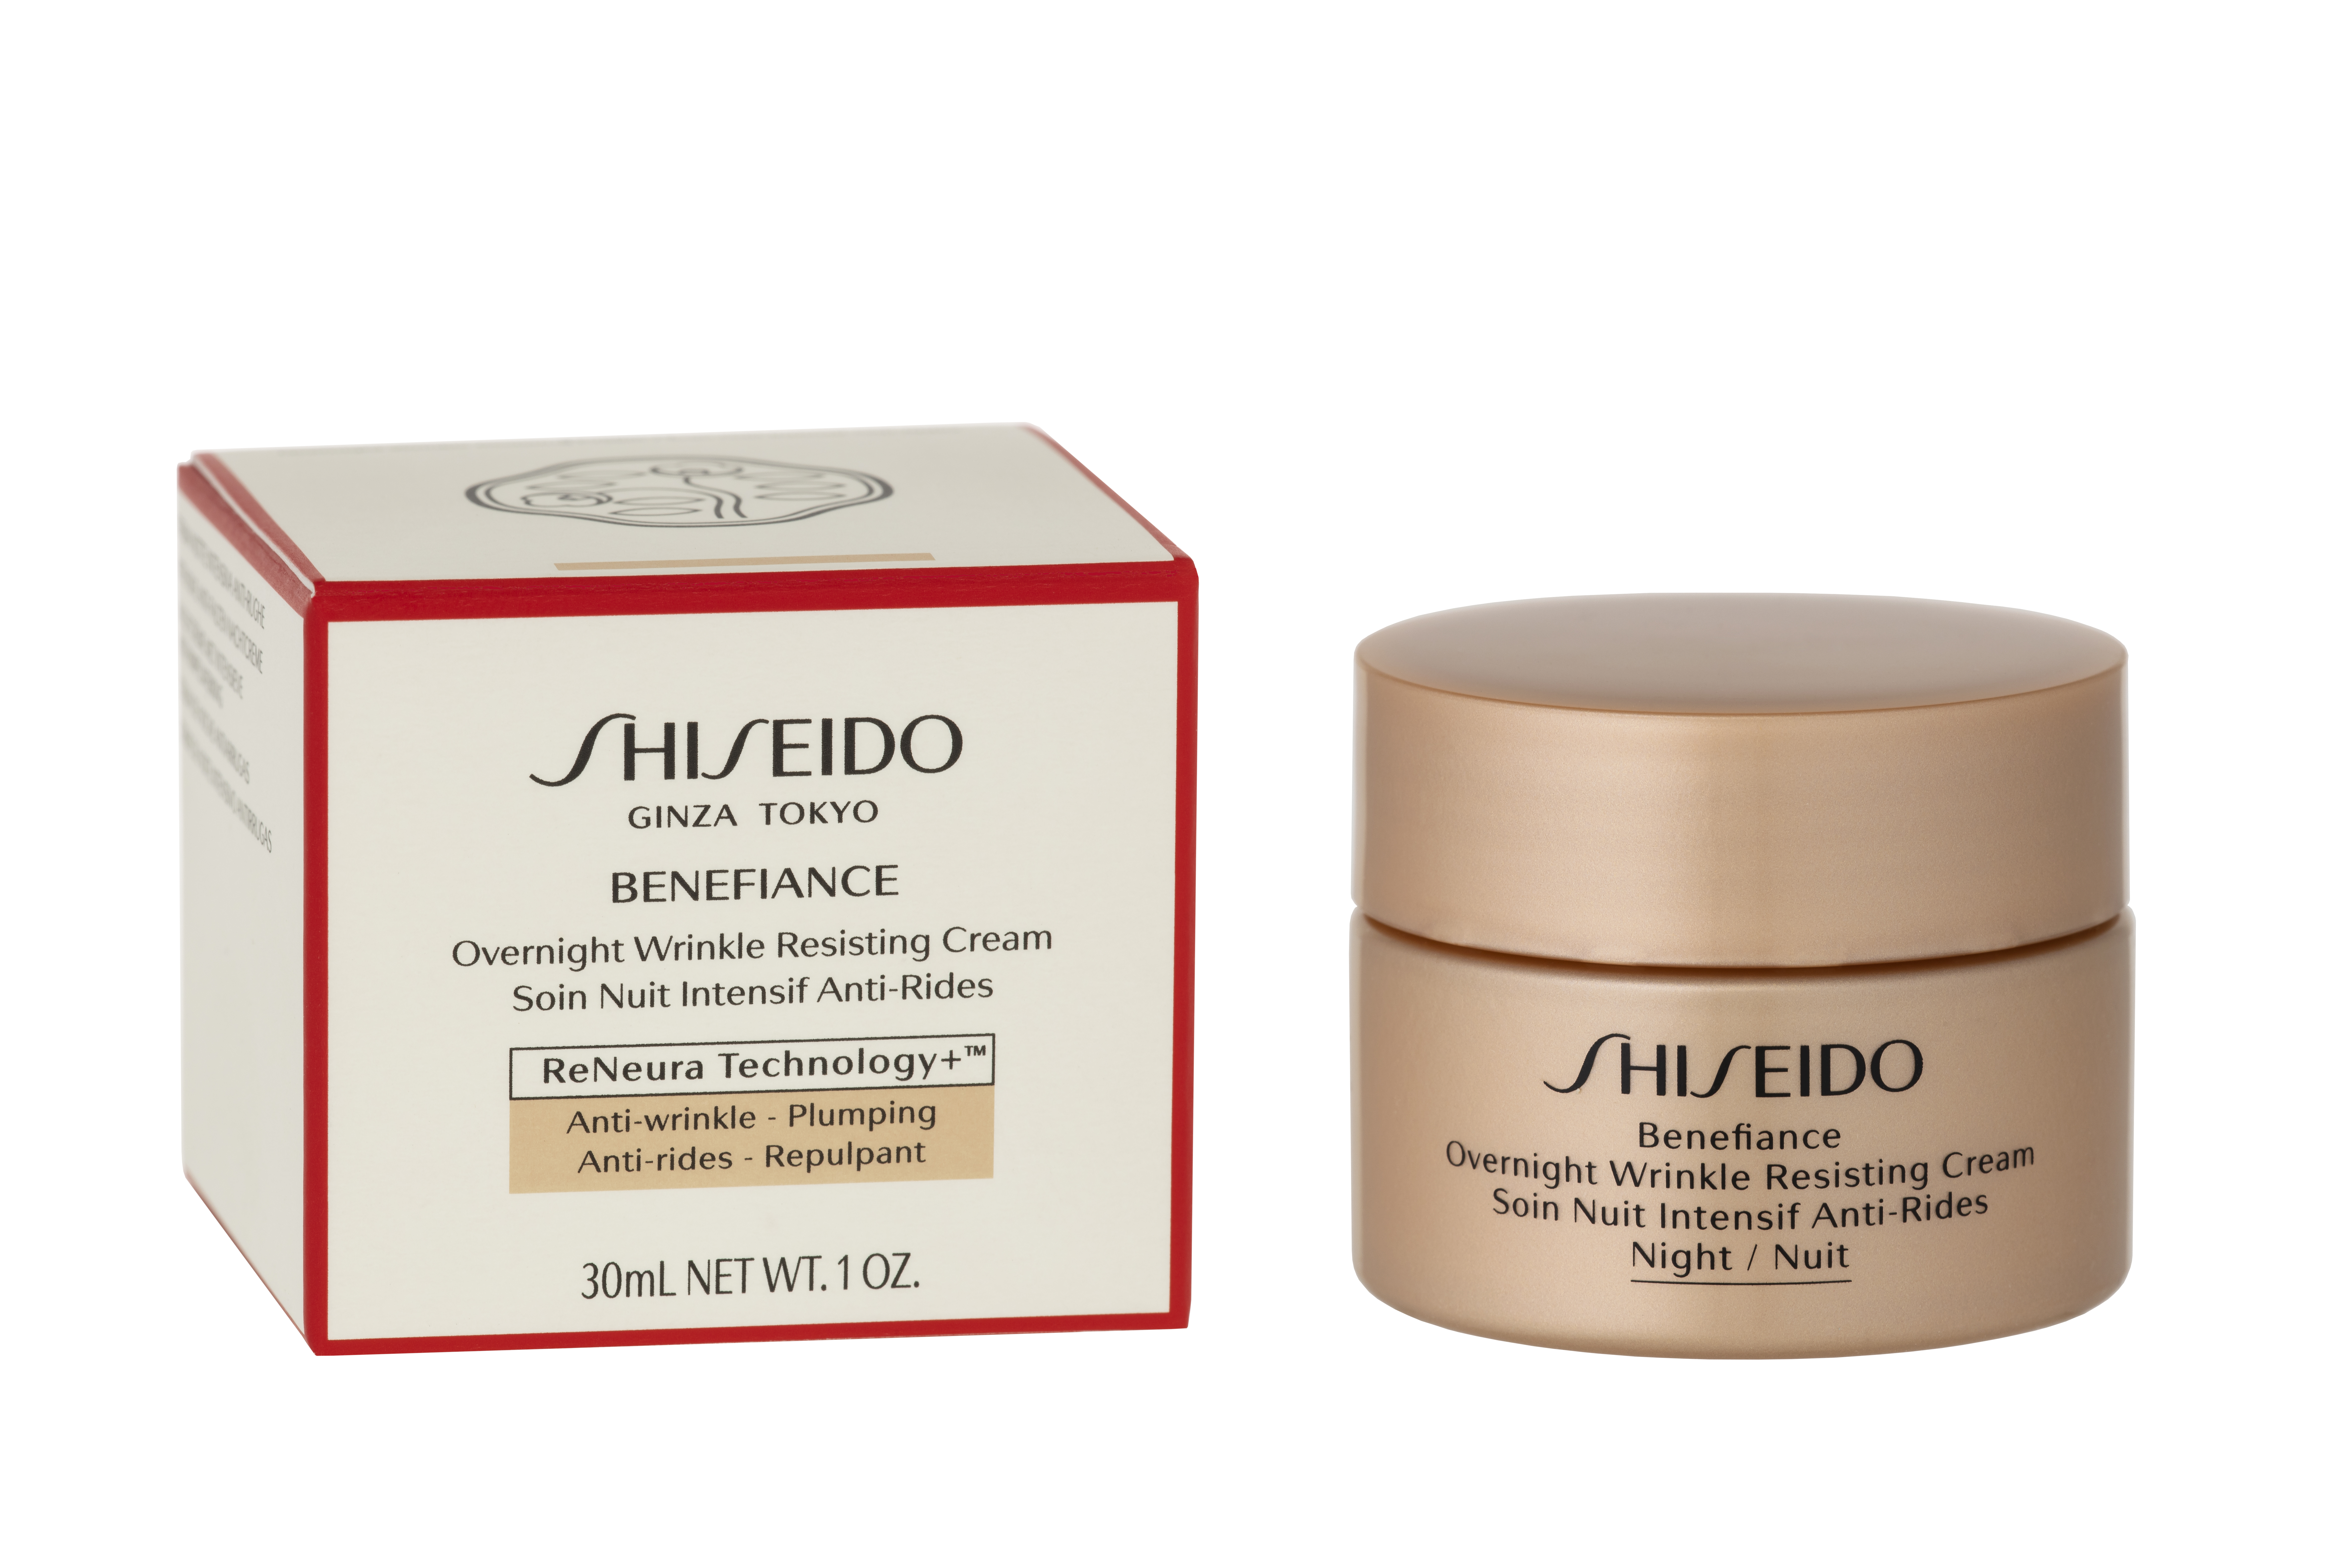 Shiseido Benefiance Anti-Wrinkle Cream